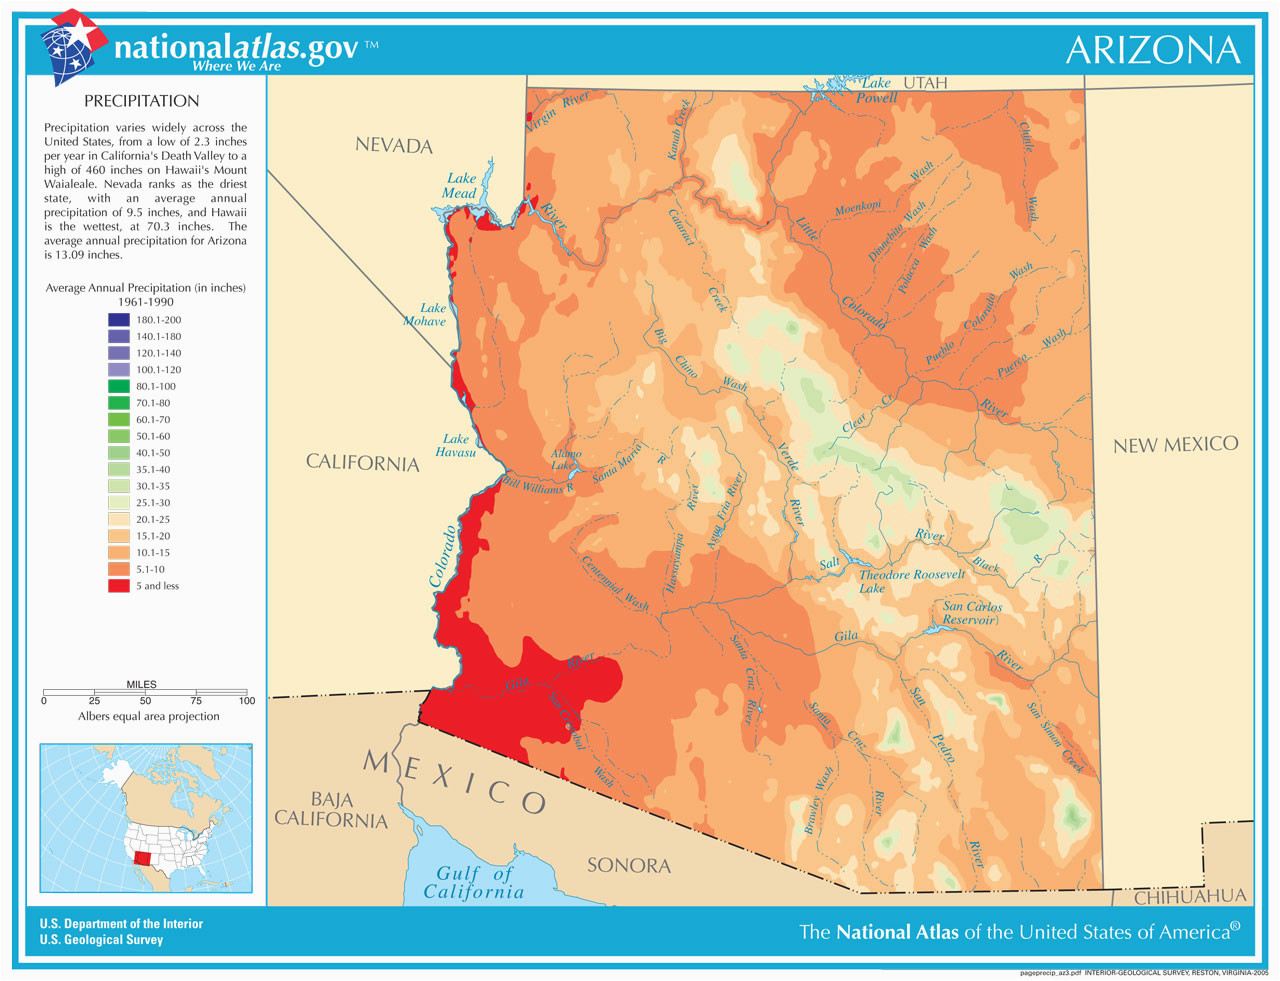 arizona s water uses and sources the arizona experience